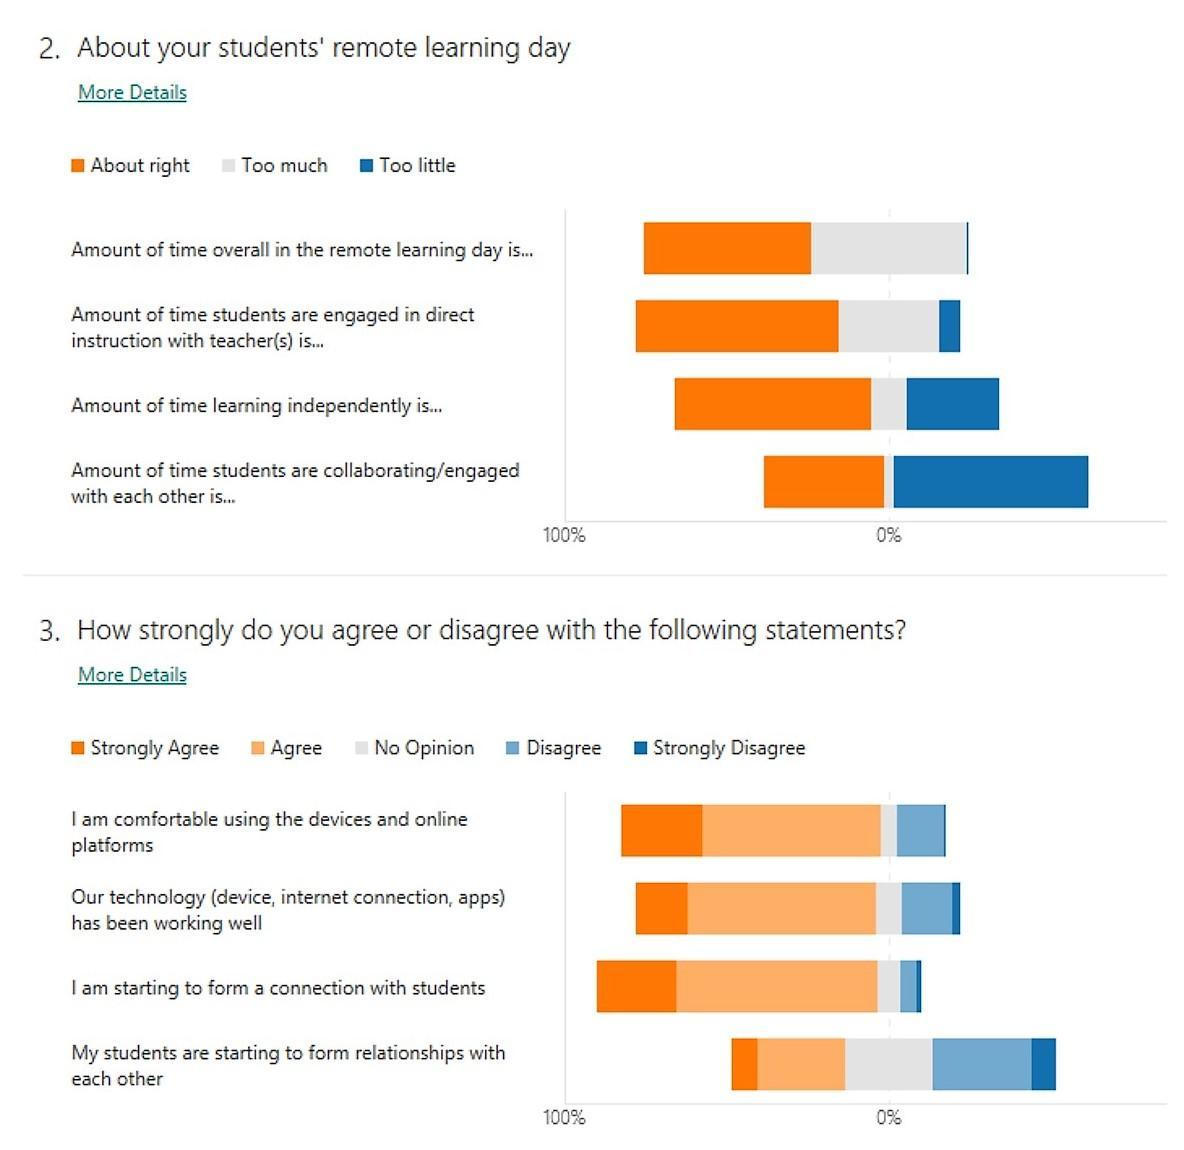 staff survey questions 2 & 3